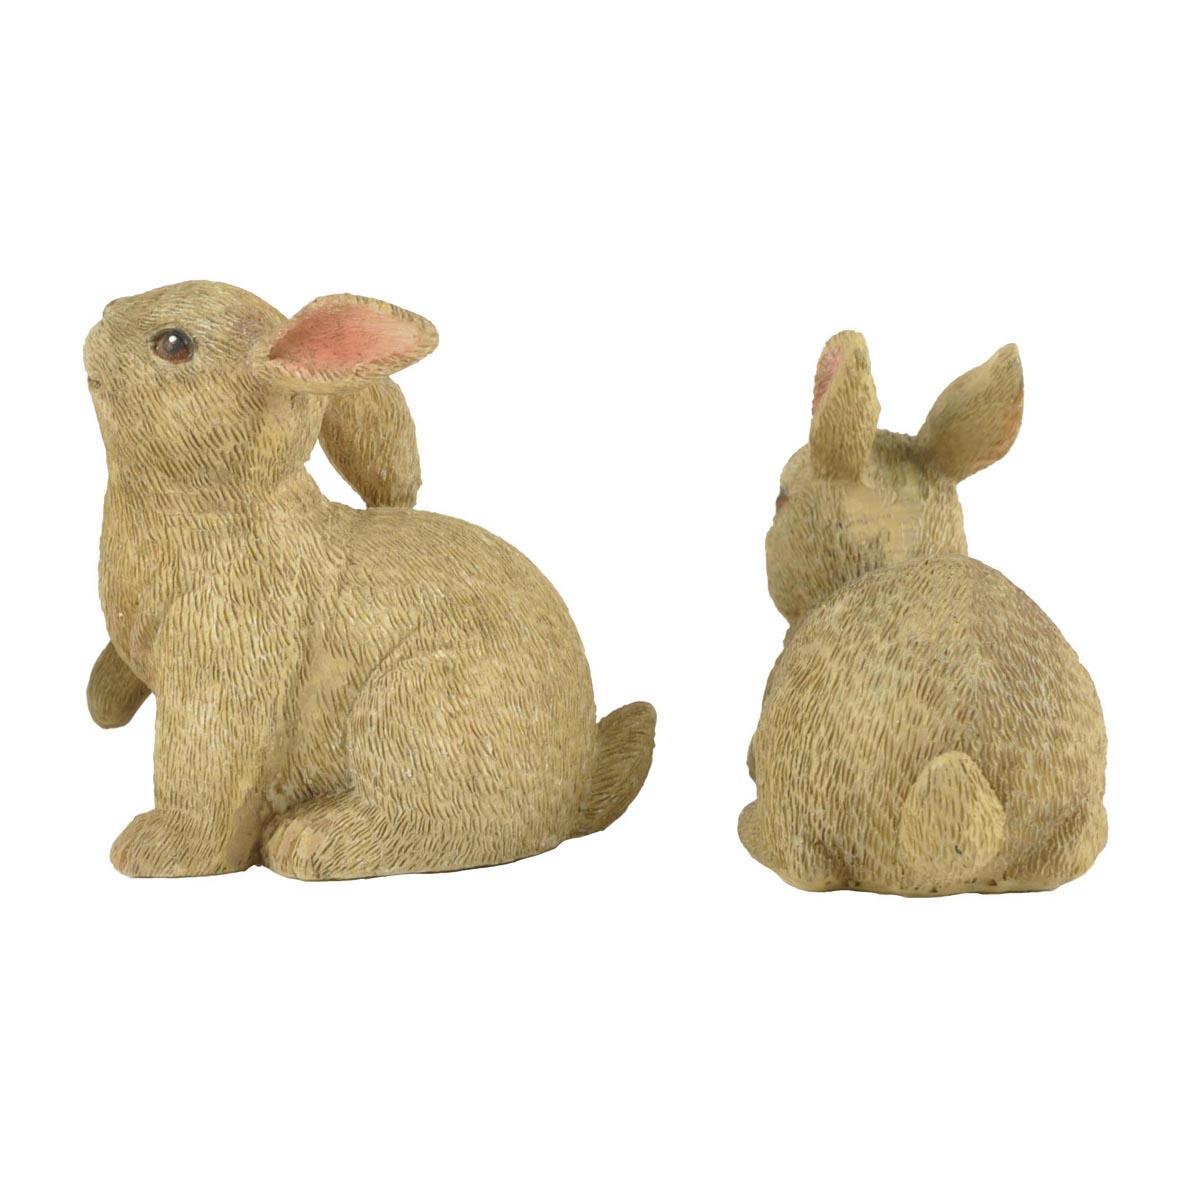 Ennas easter rabbit statues polyresin micro landscape-1